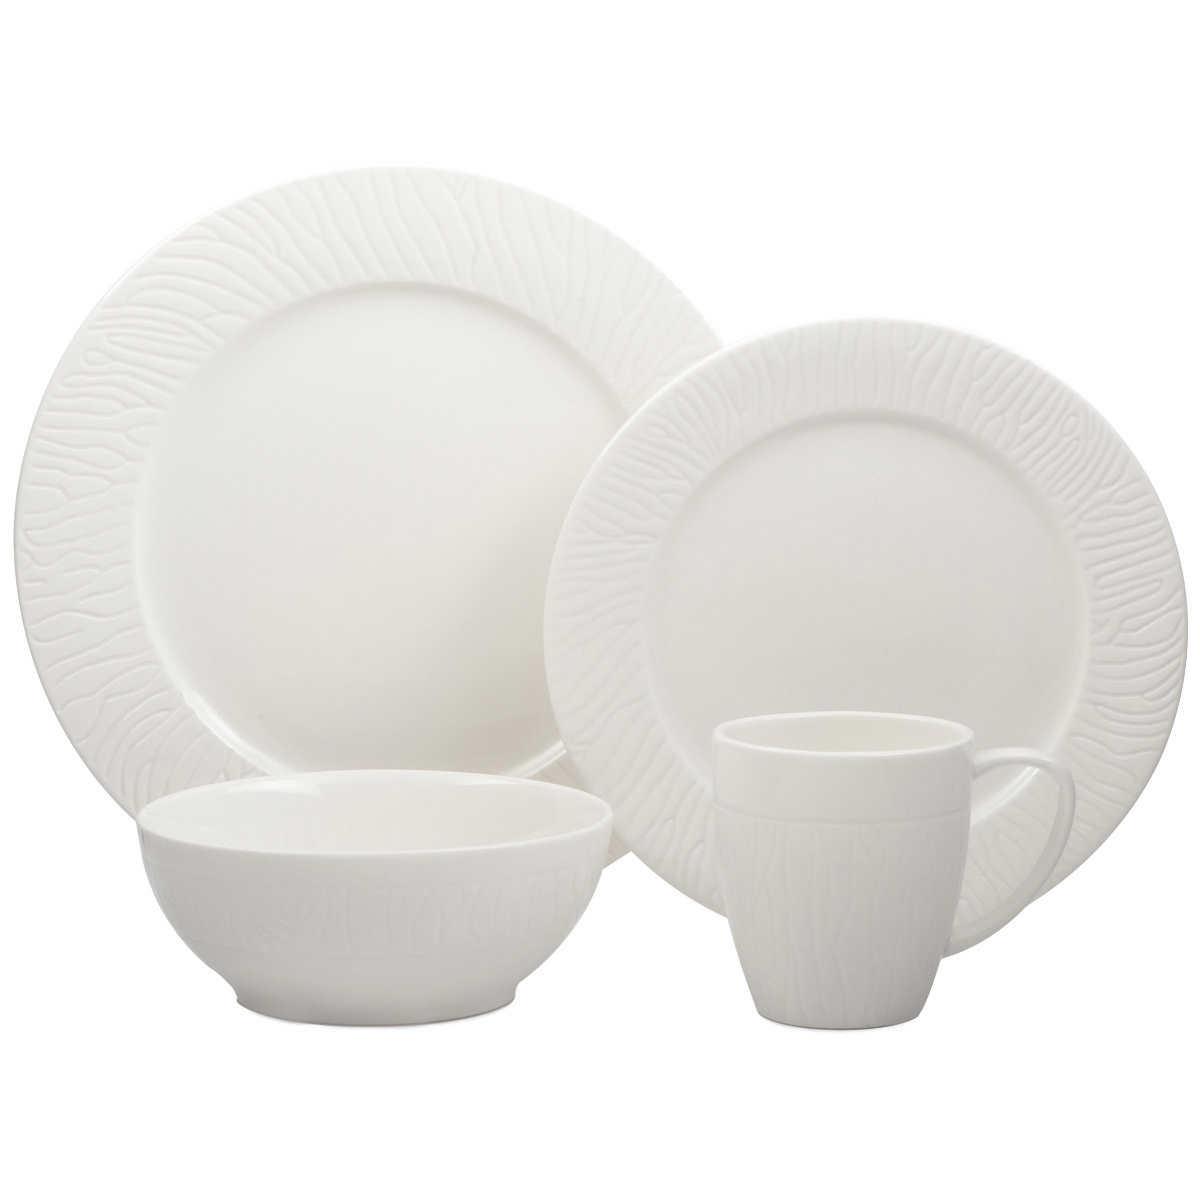 Roscher 32-piece Pure Square Fine Porcelain Dinnerware Set